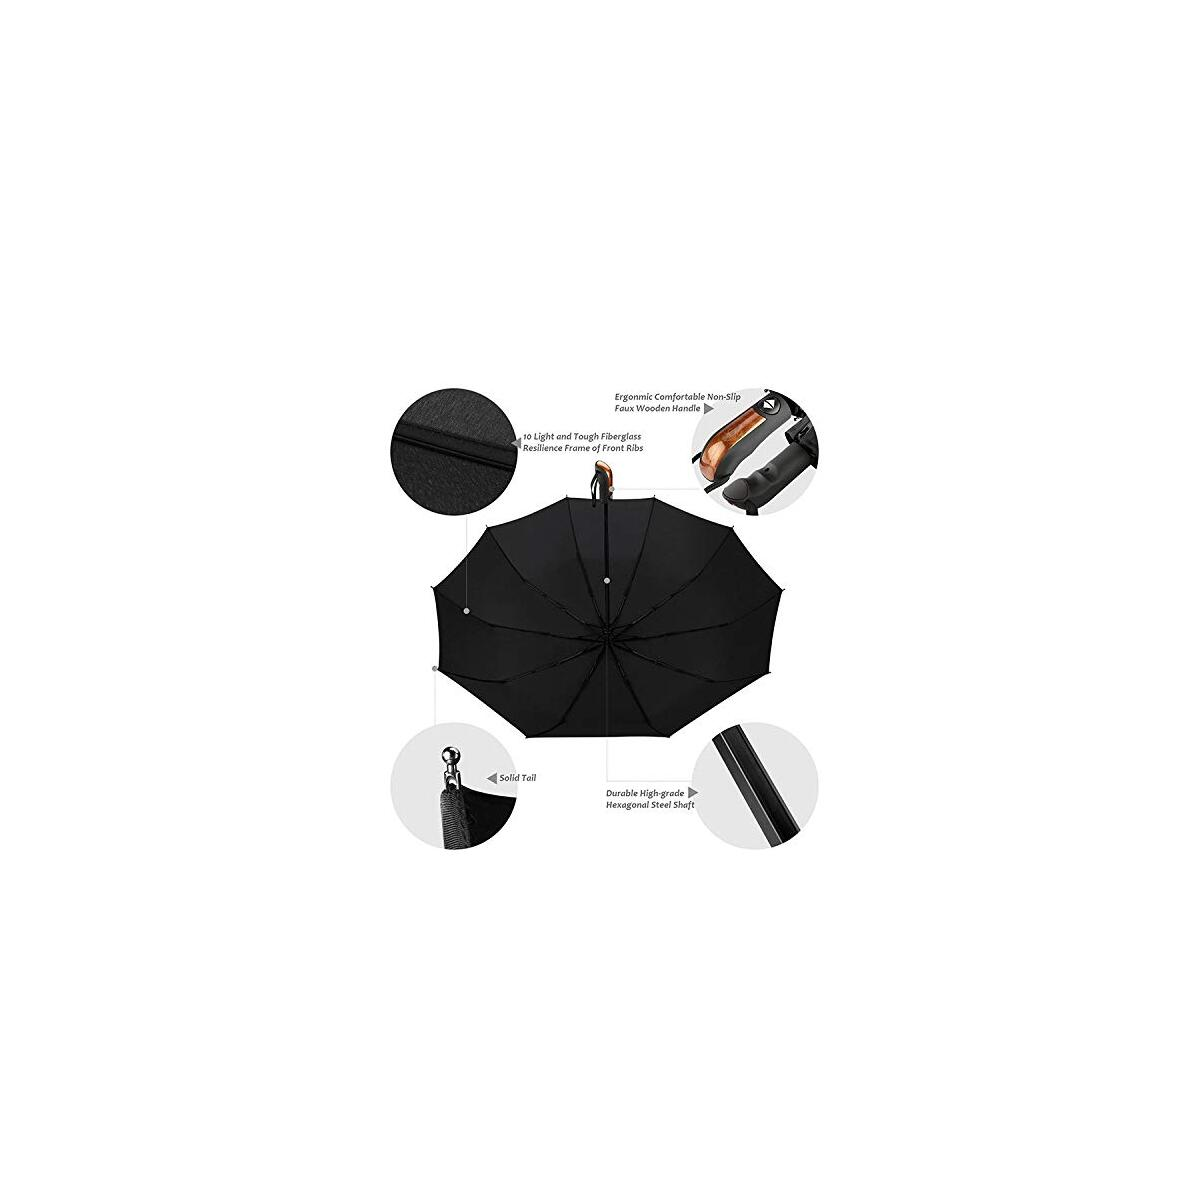 JONAKI Premium Quality Unique Design Umbrella - 10 Ribs 23 Inches - User-Friendly Portable, Lightweight Automatic Travel Reinforced Canopy Umbrella